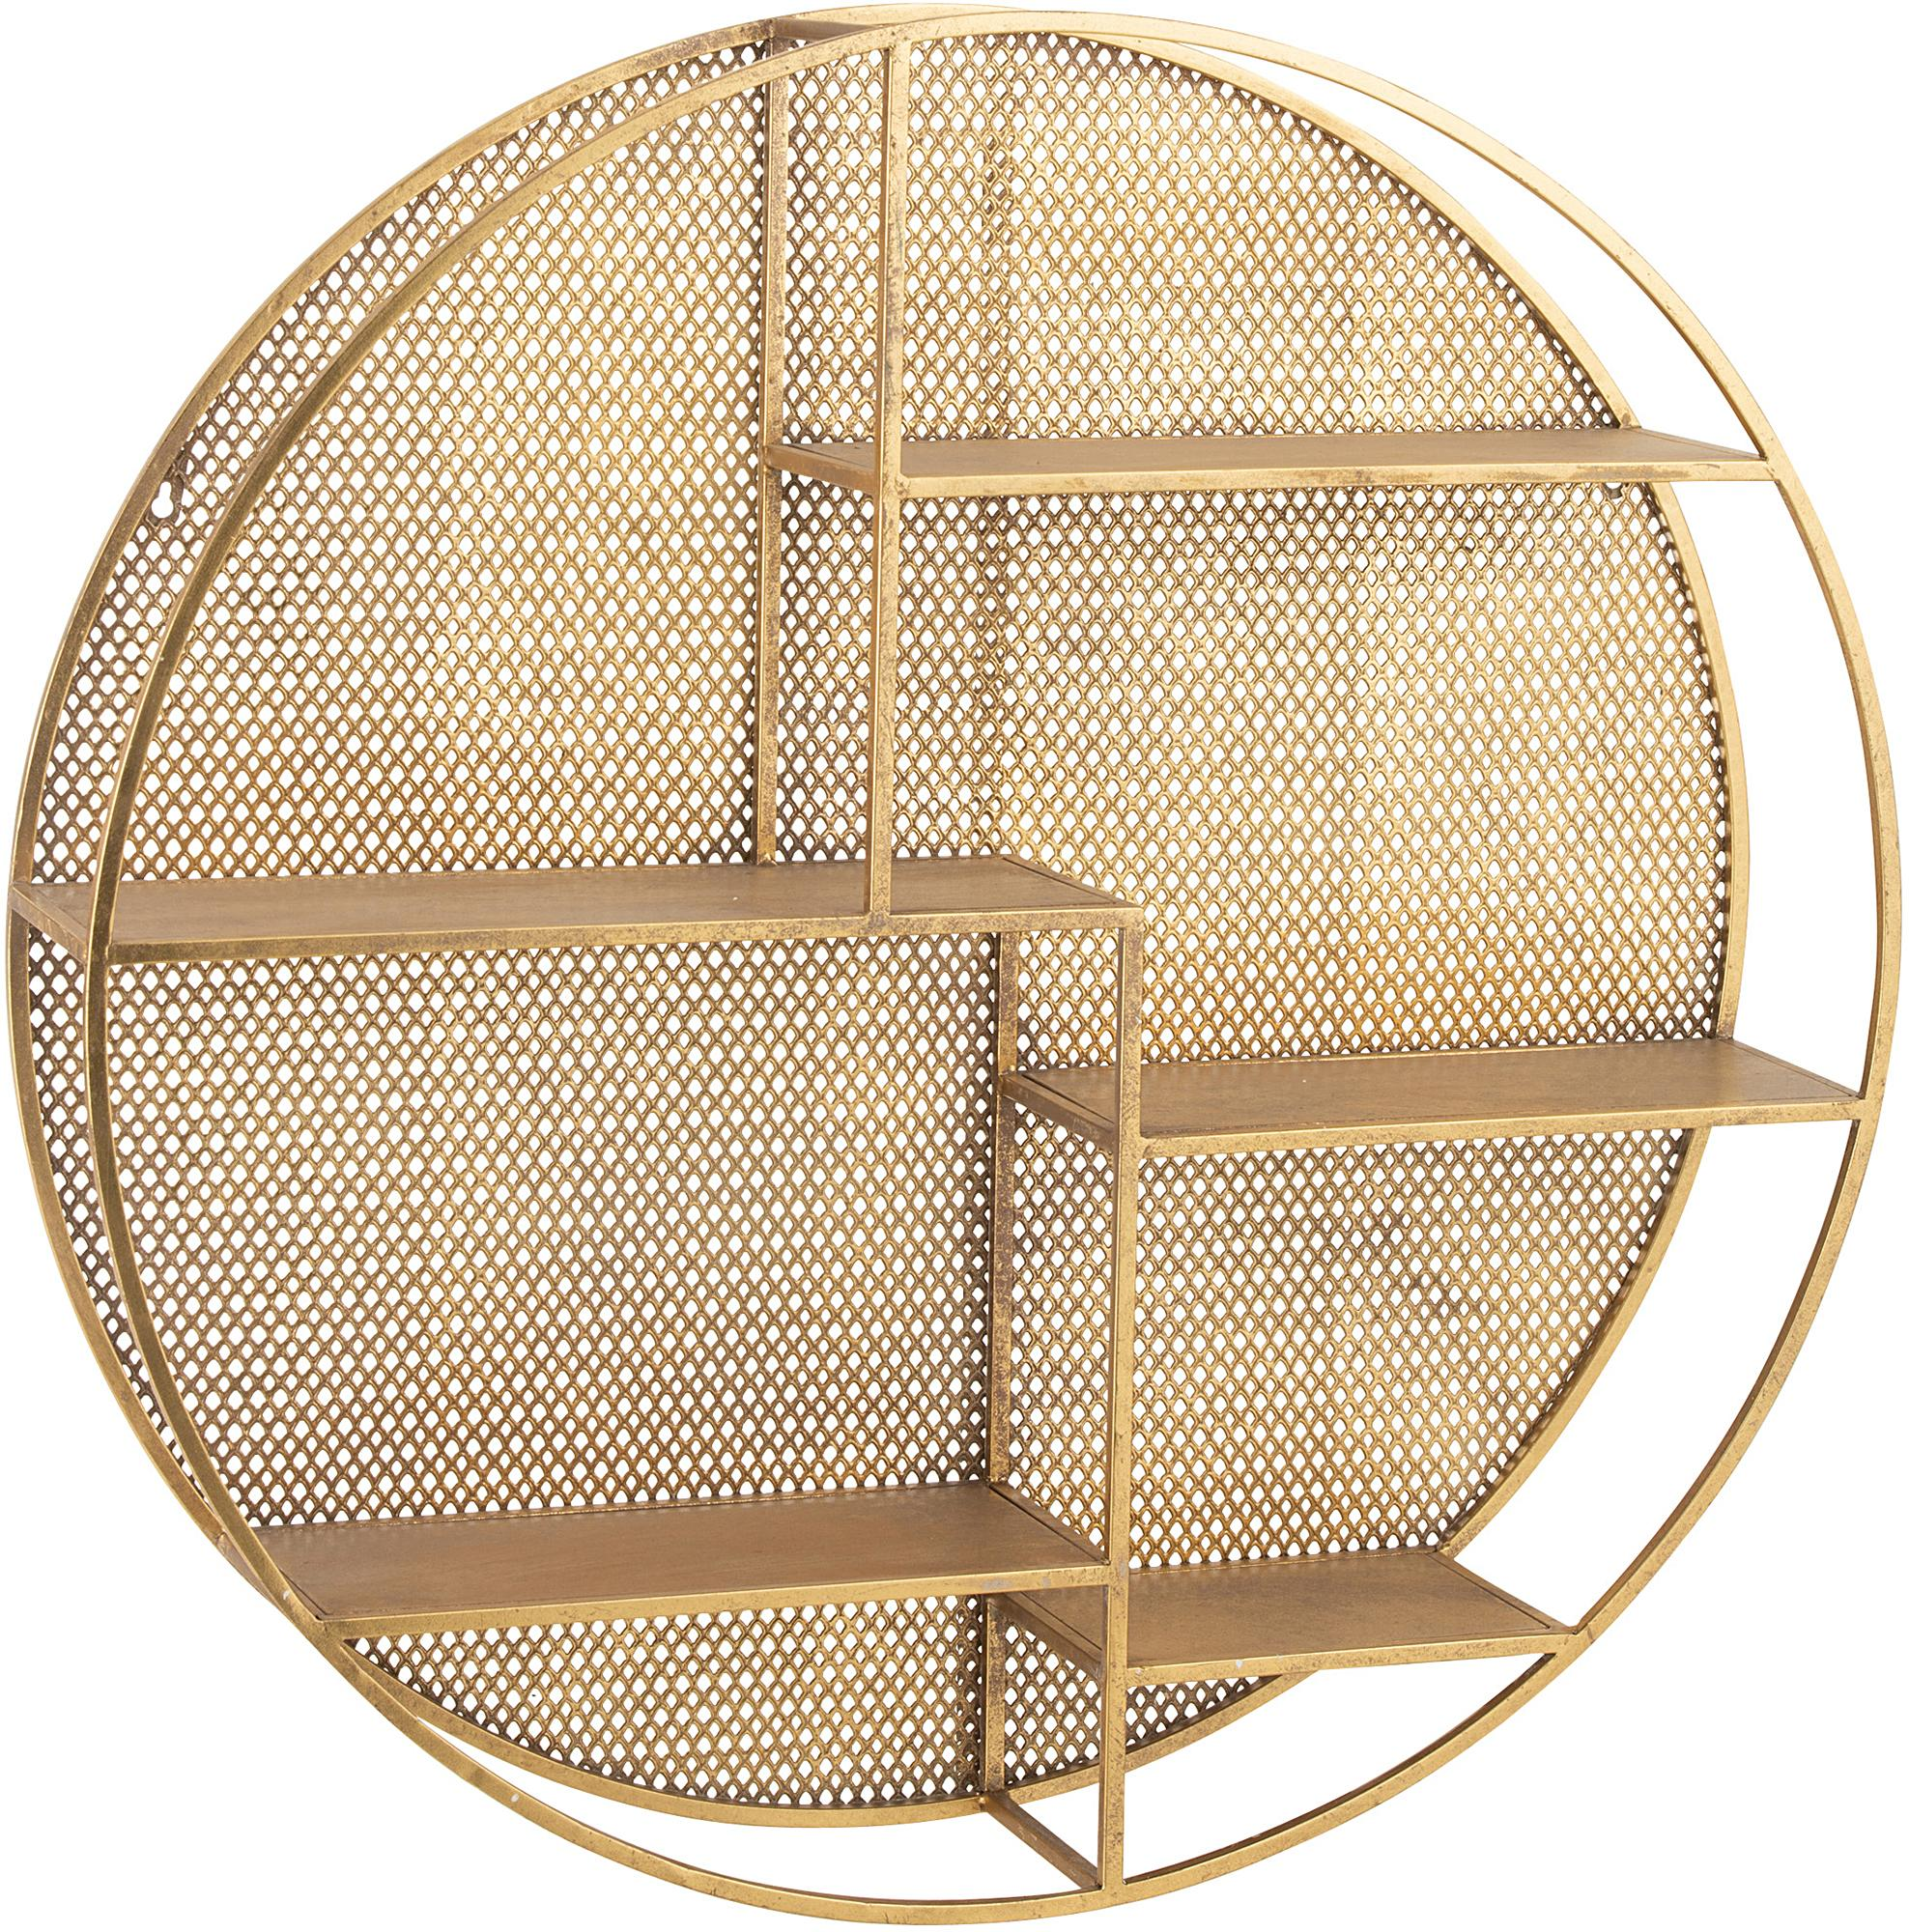 Rundes Metall-Wandregal Mimau, Metall, lackiert, Goldfarben, Ø 92 cm